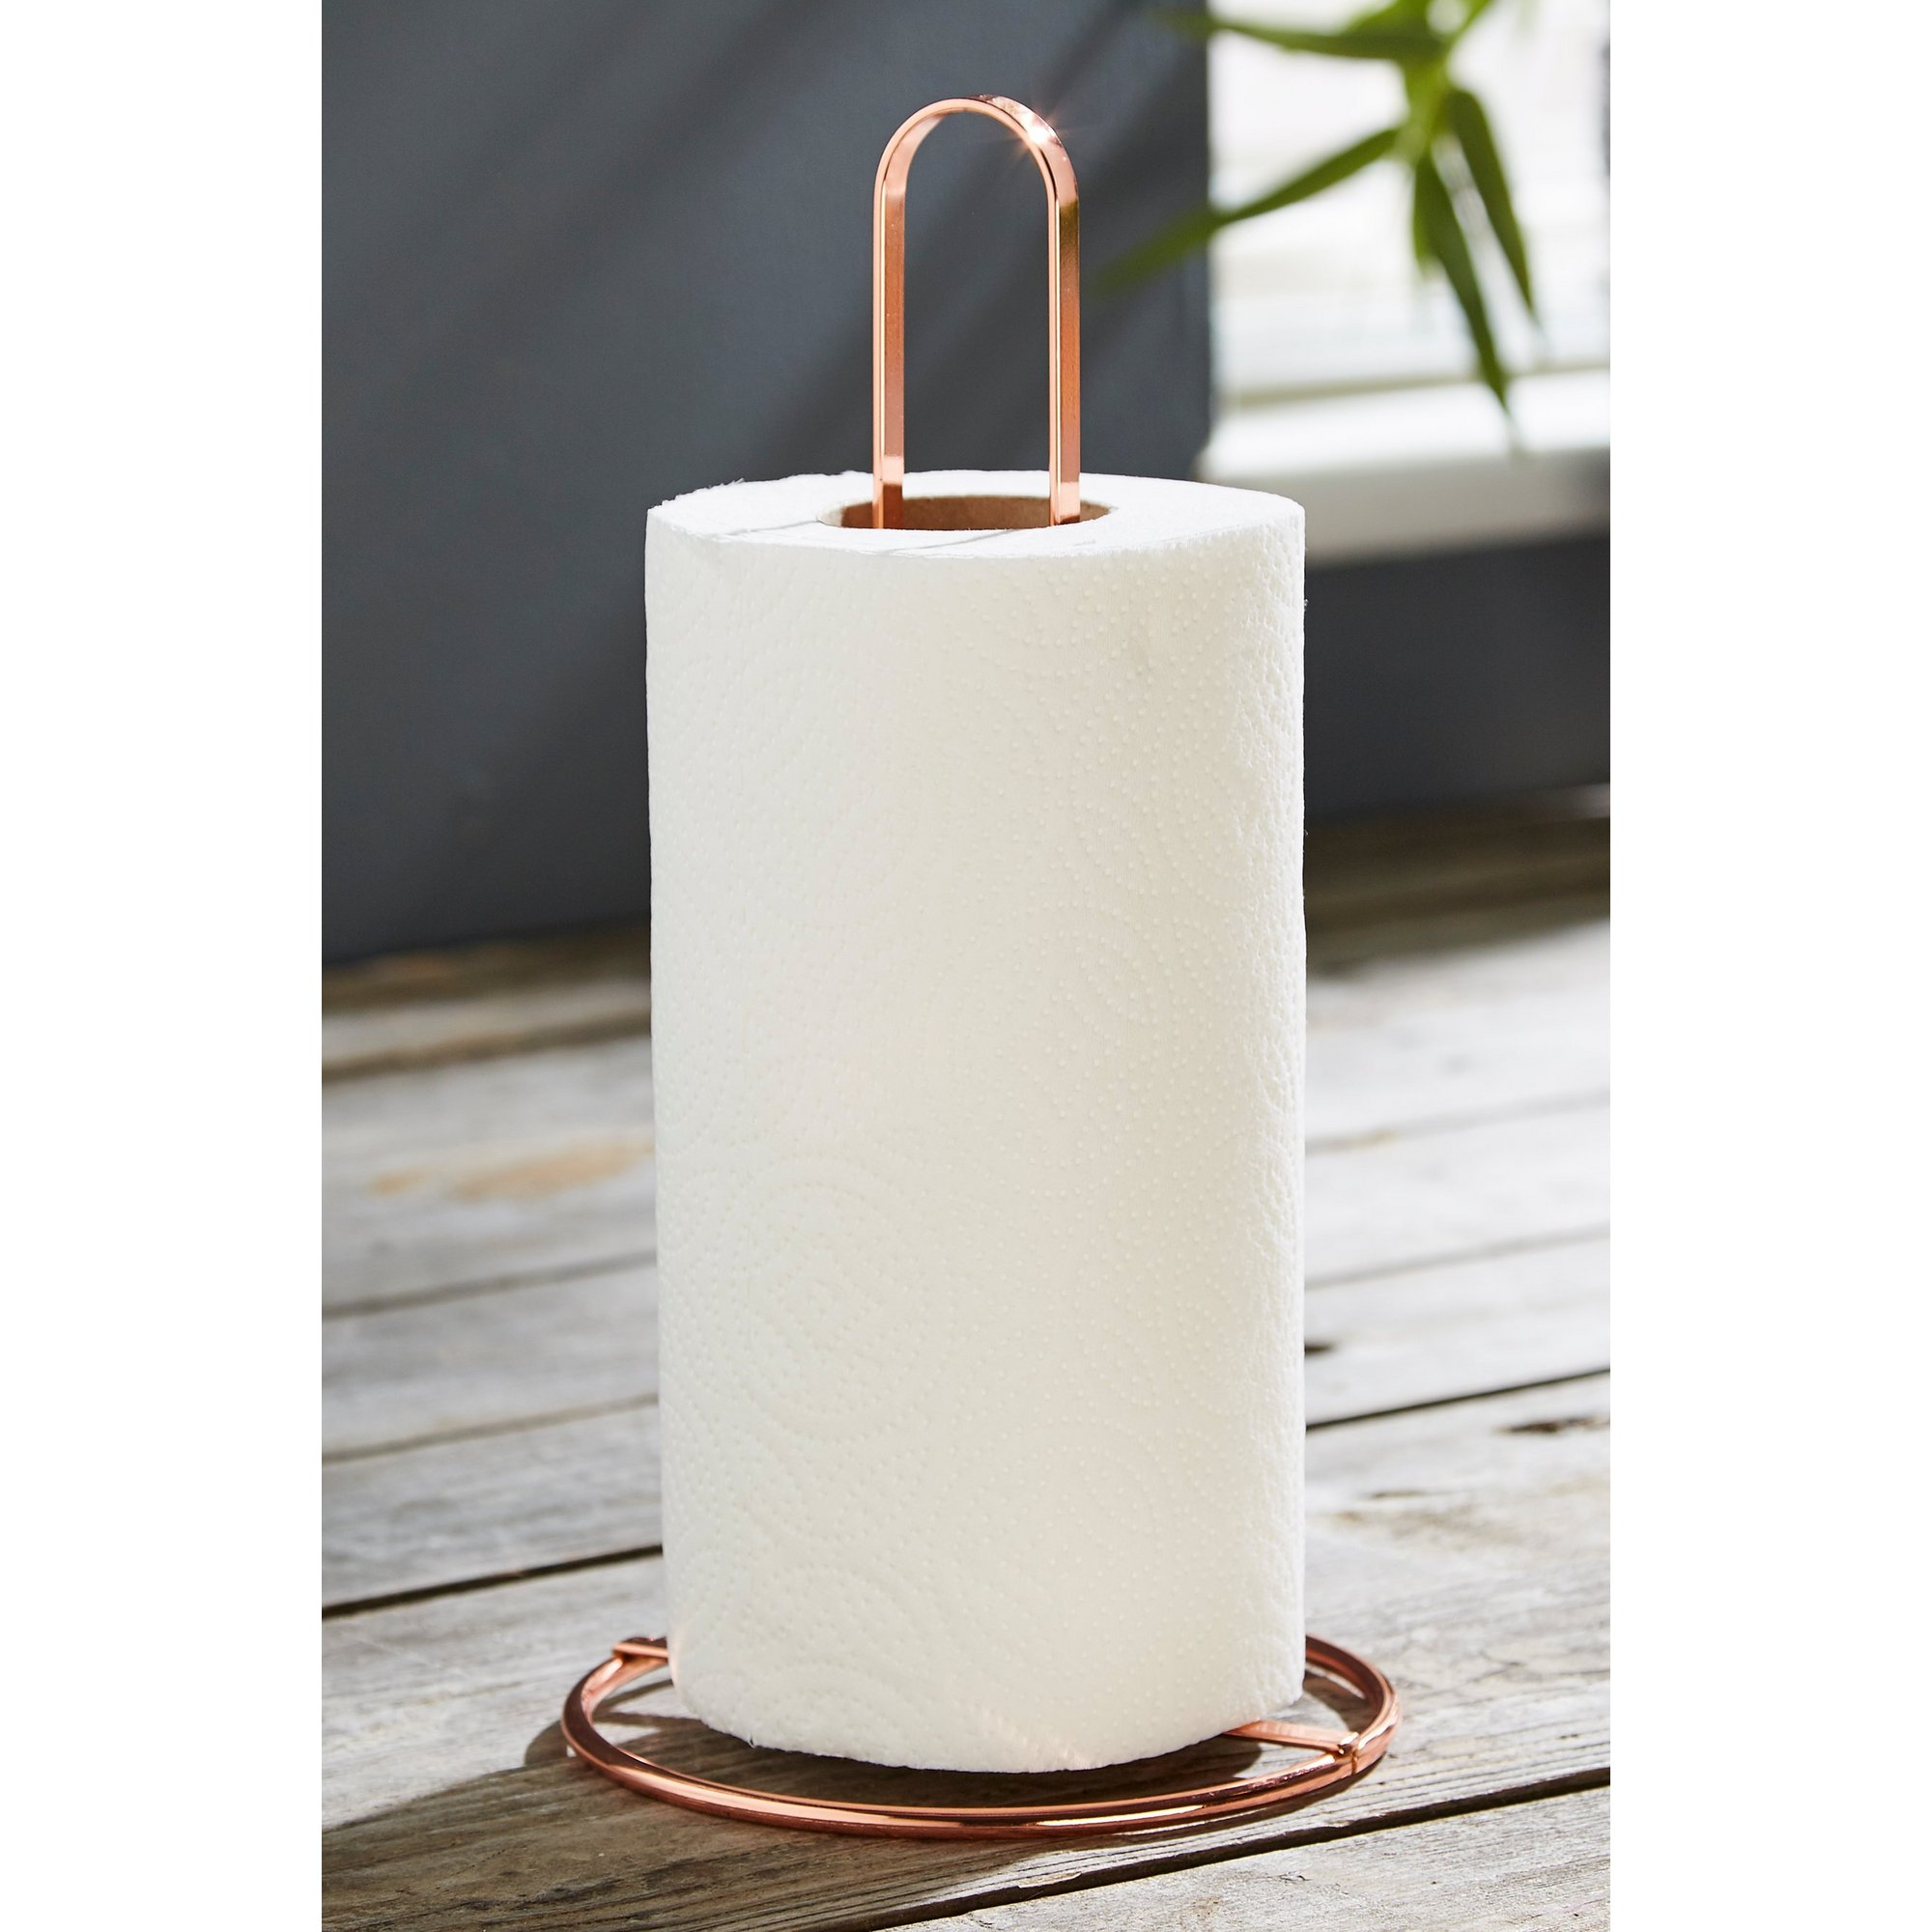 Image of Copper Kitchen Roll Holder